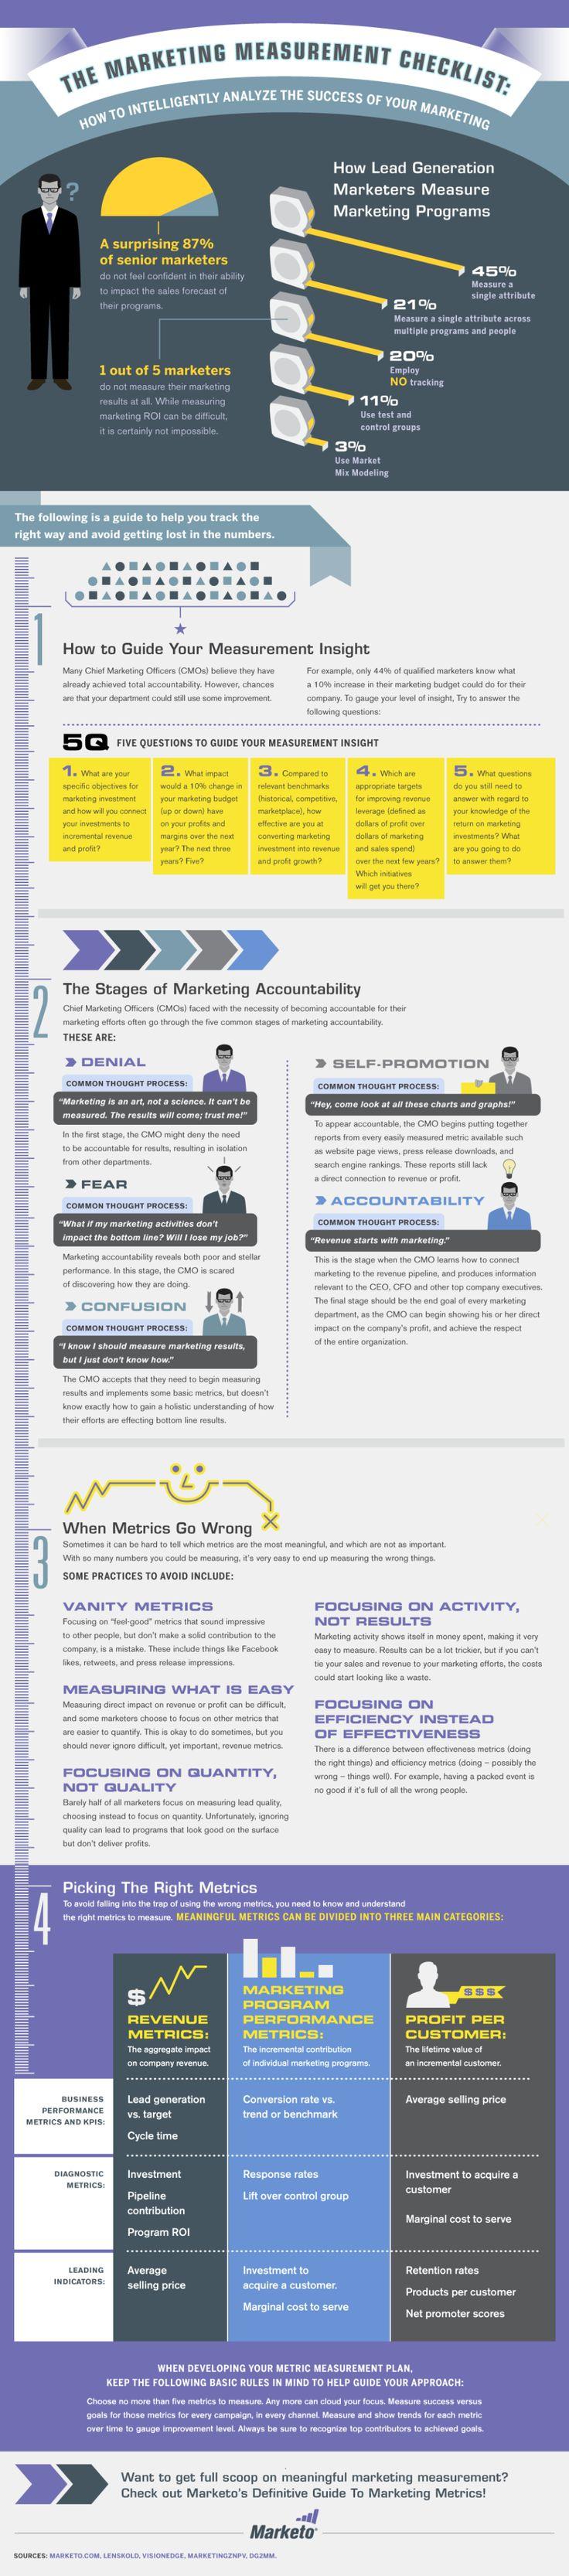 The Marketing Measurement Checklist Internet Site, Checklist Infographic,  Website, Web Site, Social Media, Marketing Measuring, Socialmedia, Measuring Checklist, Marketing Infographic